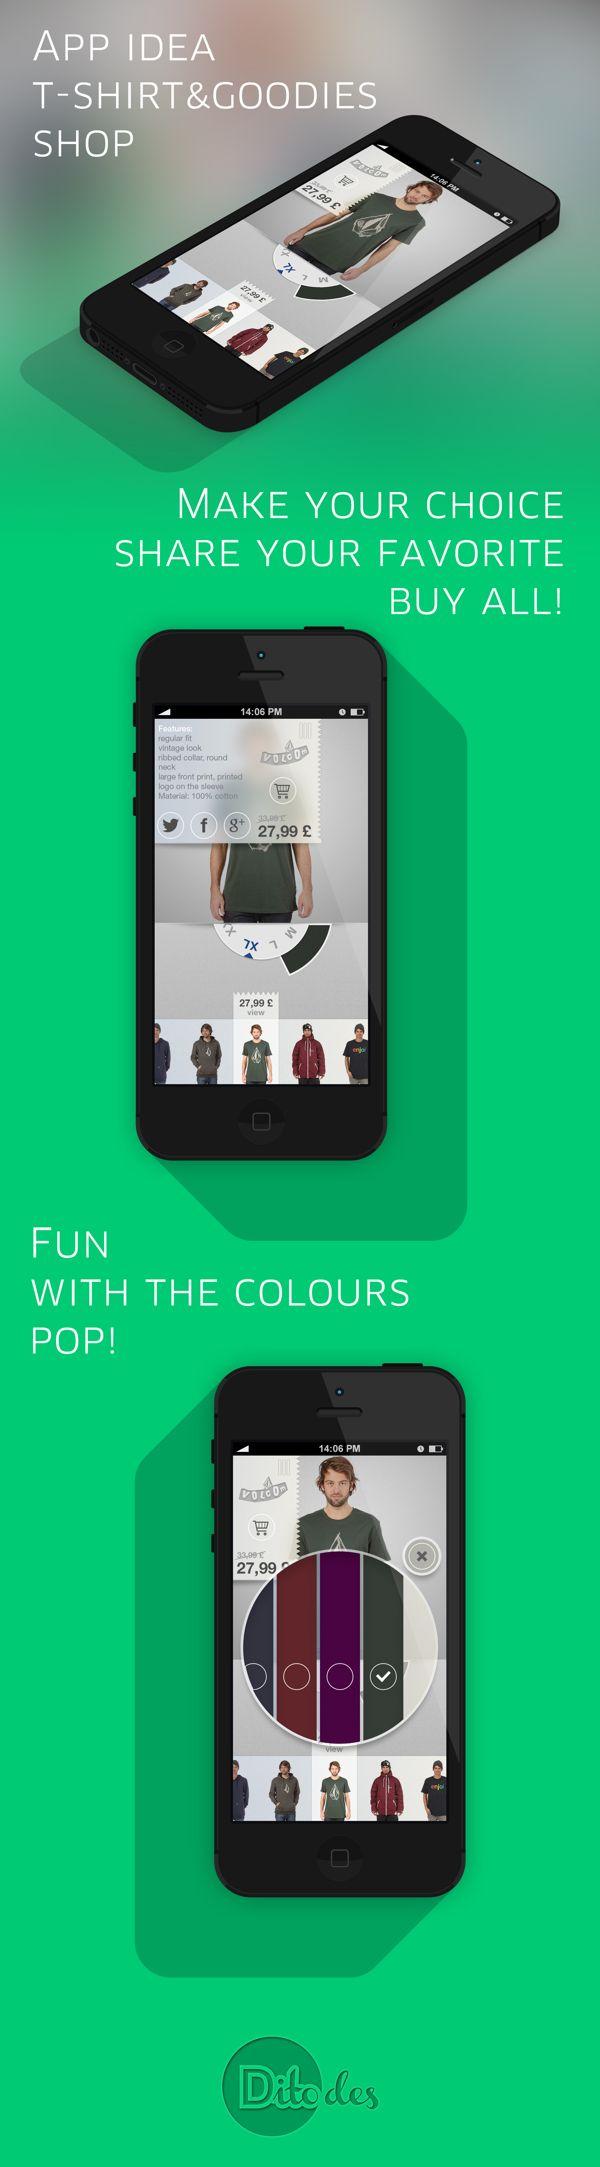 SlipSlapShirt App by Luca Di Tomassi, via Behance  #shirts #ios7 #app #nikhil